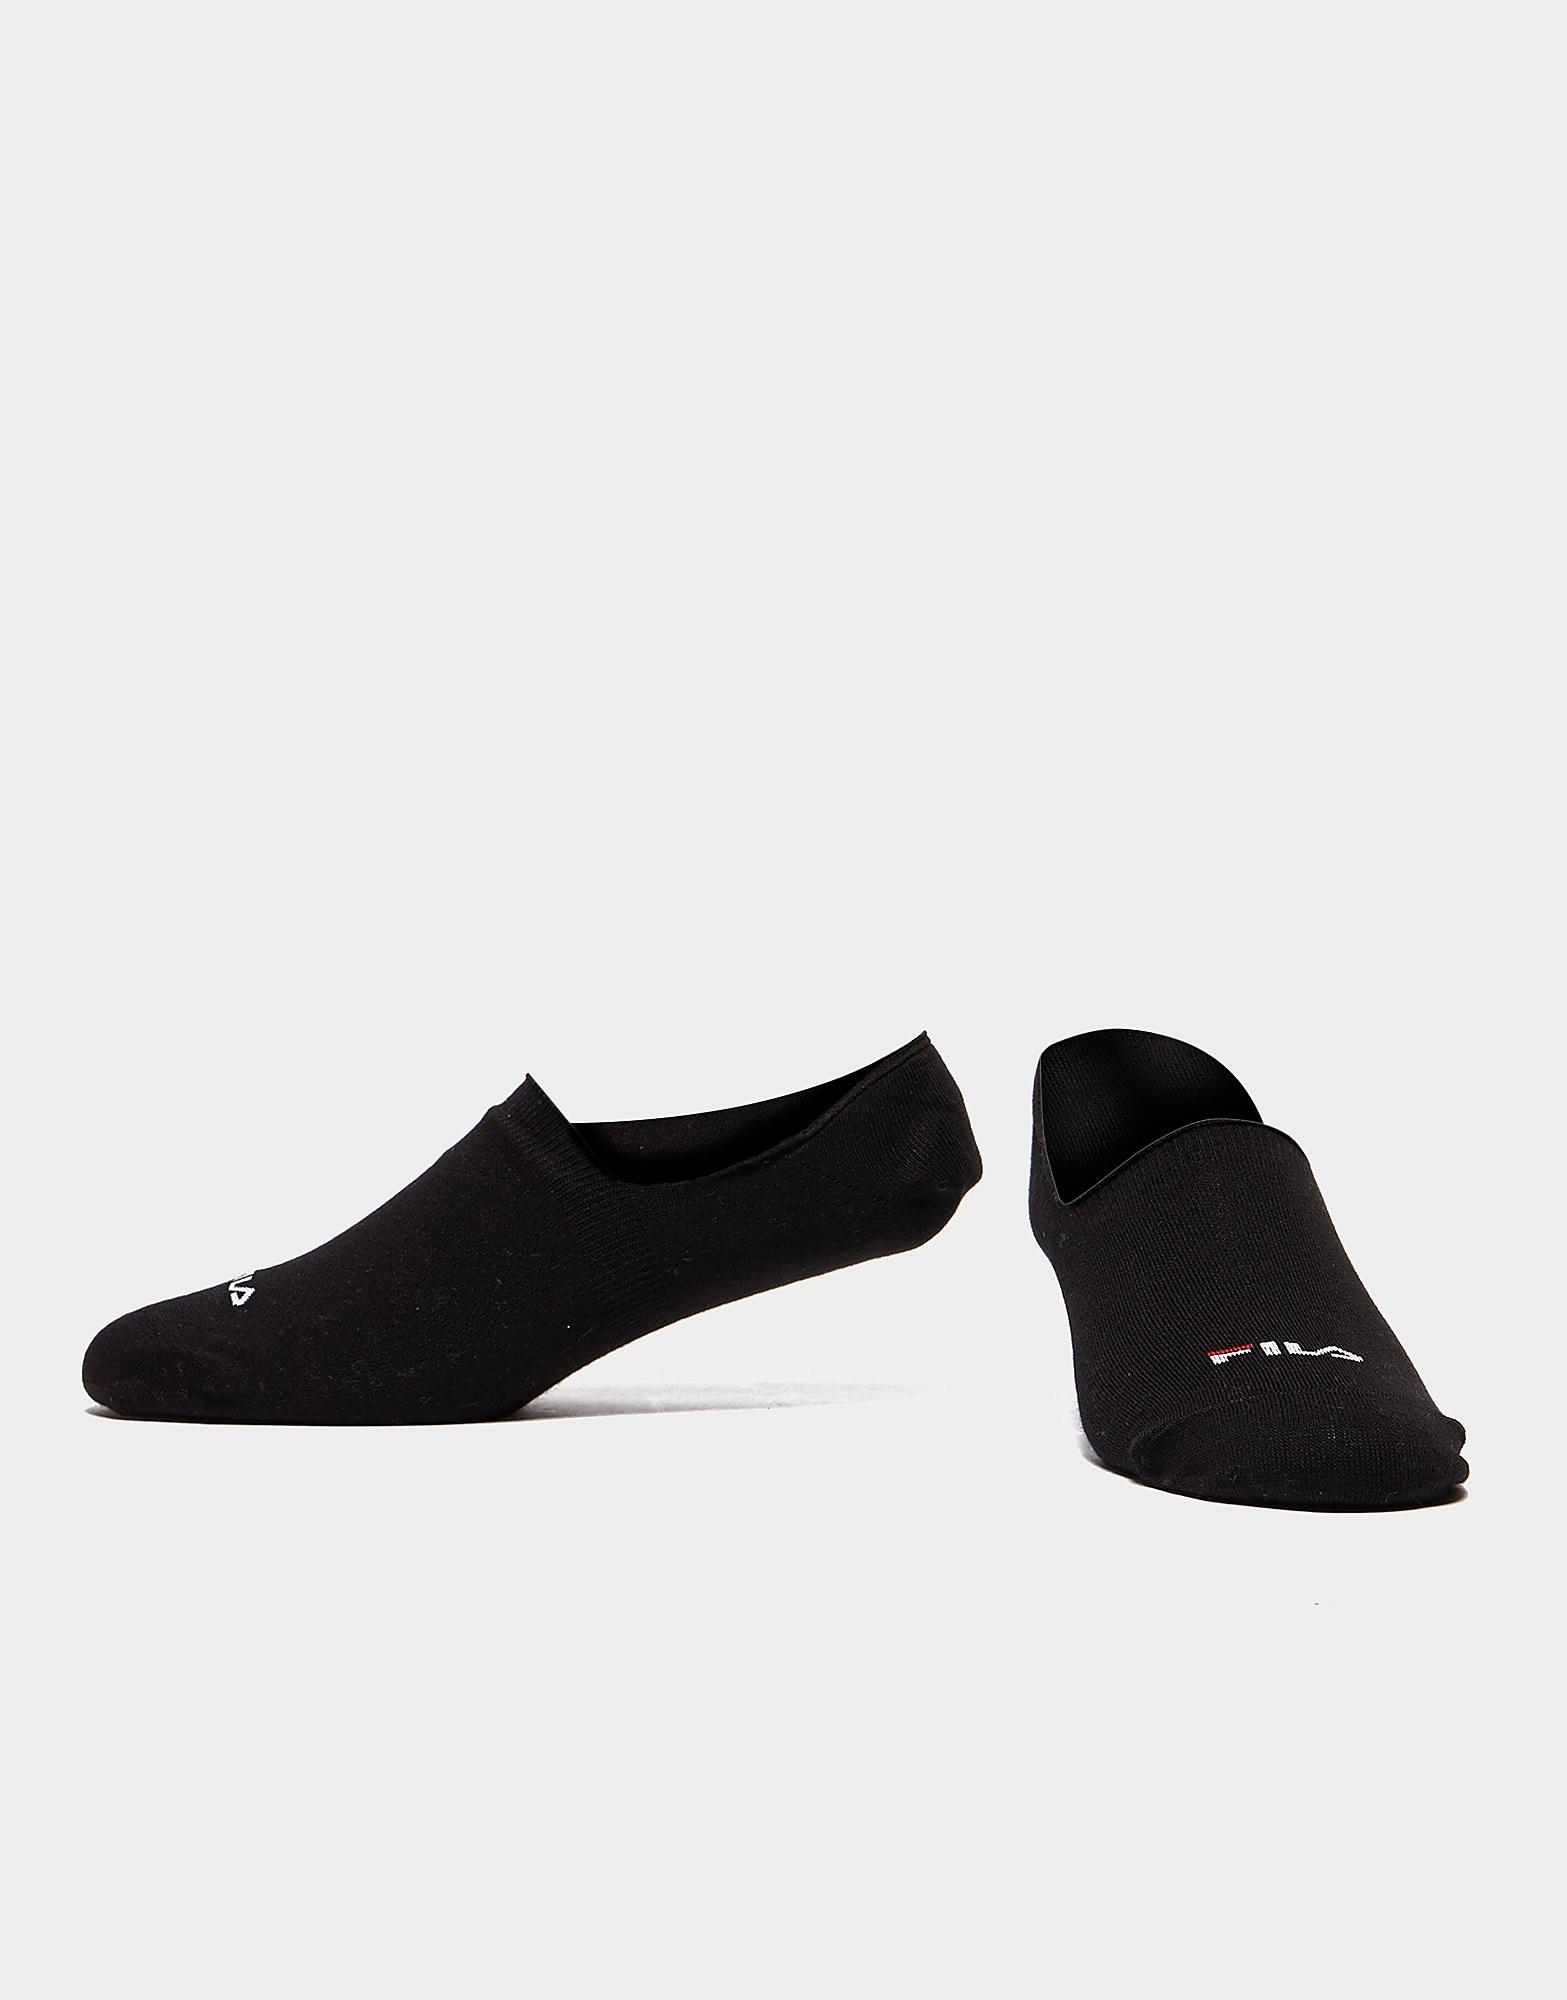 Fila Invisible Socks 3 Pack